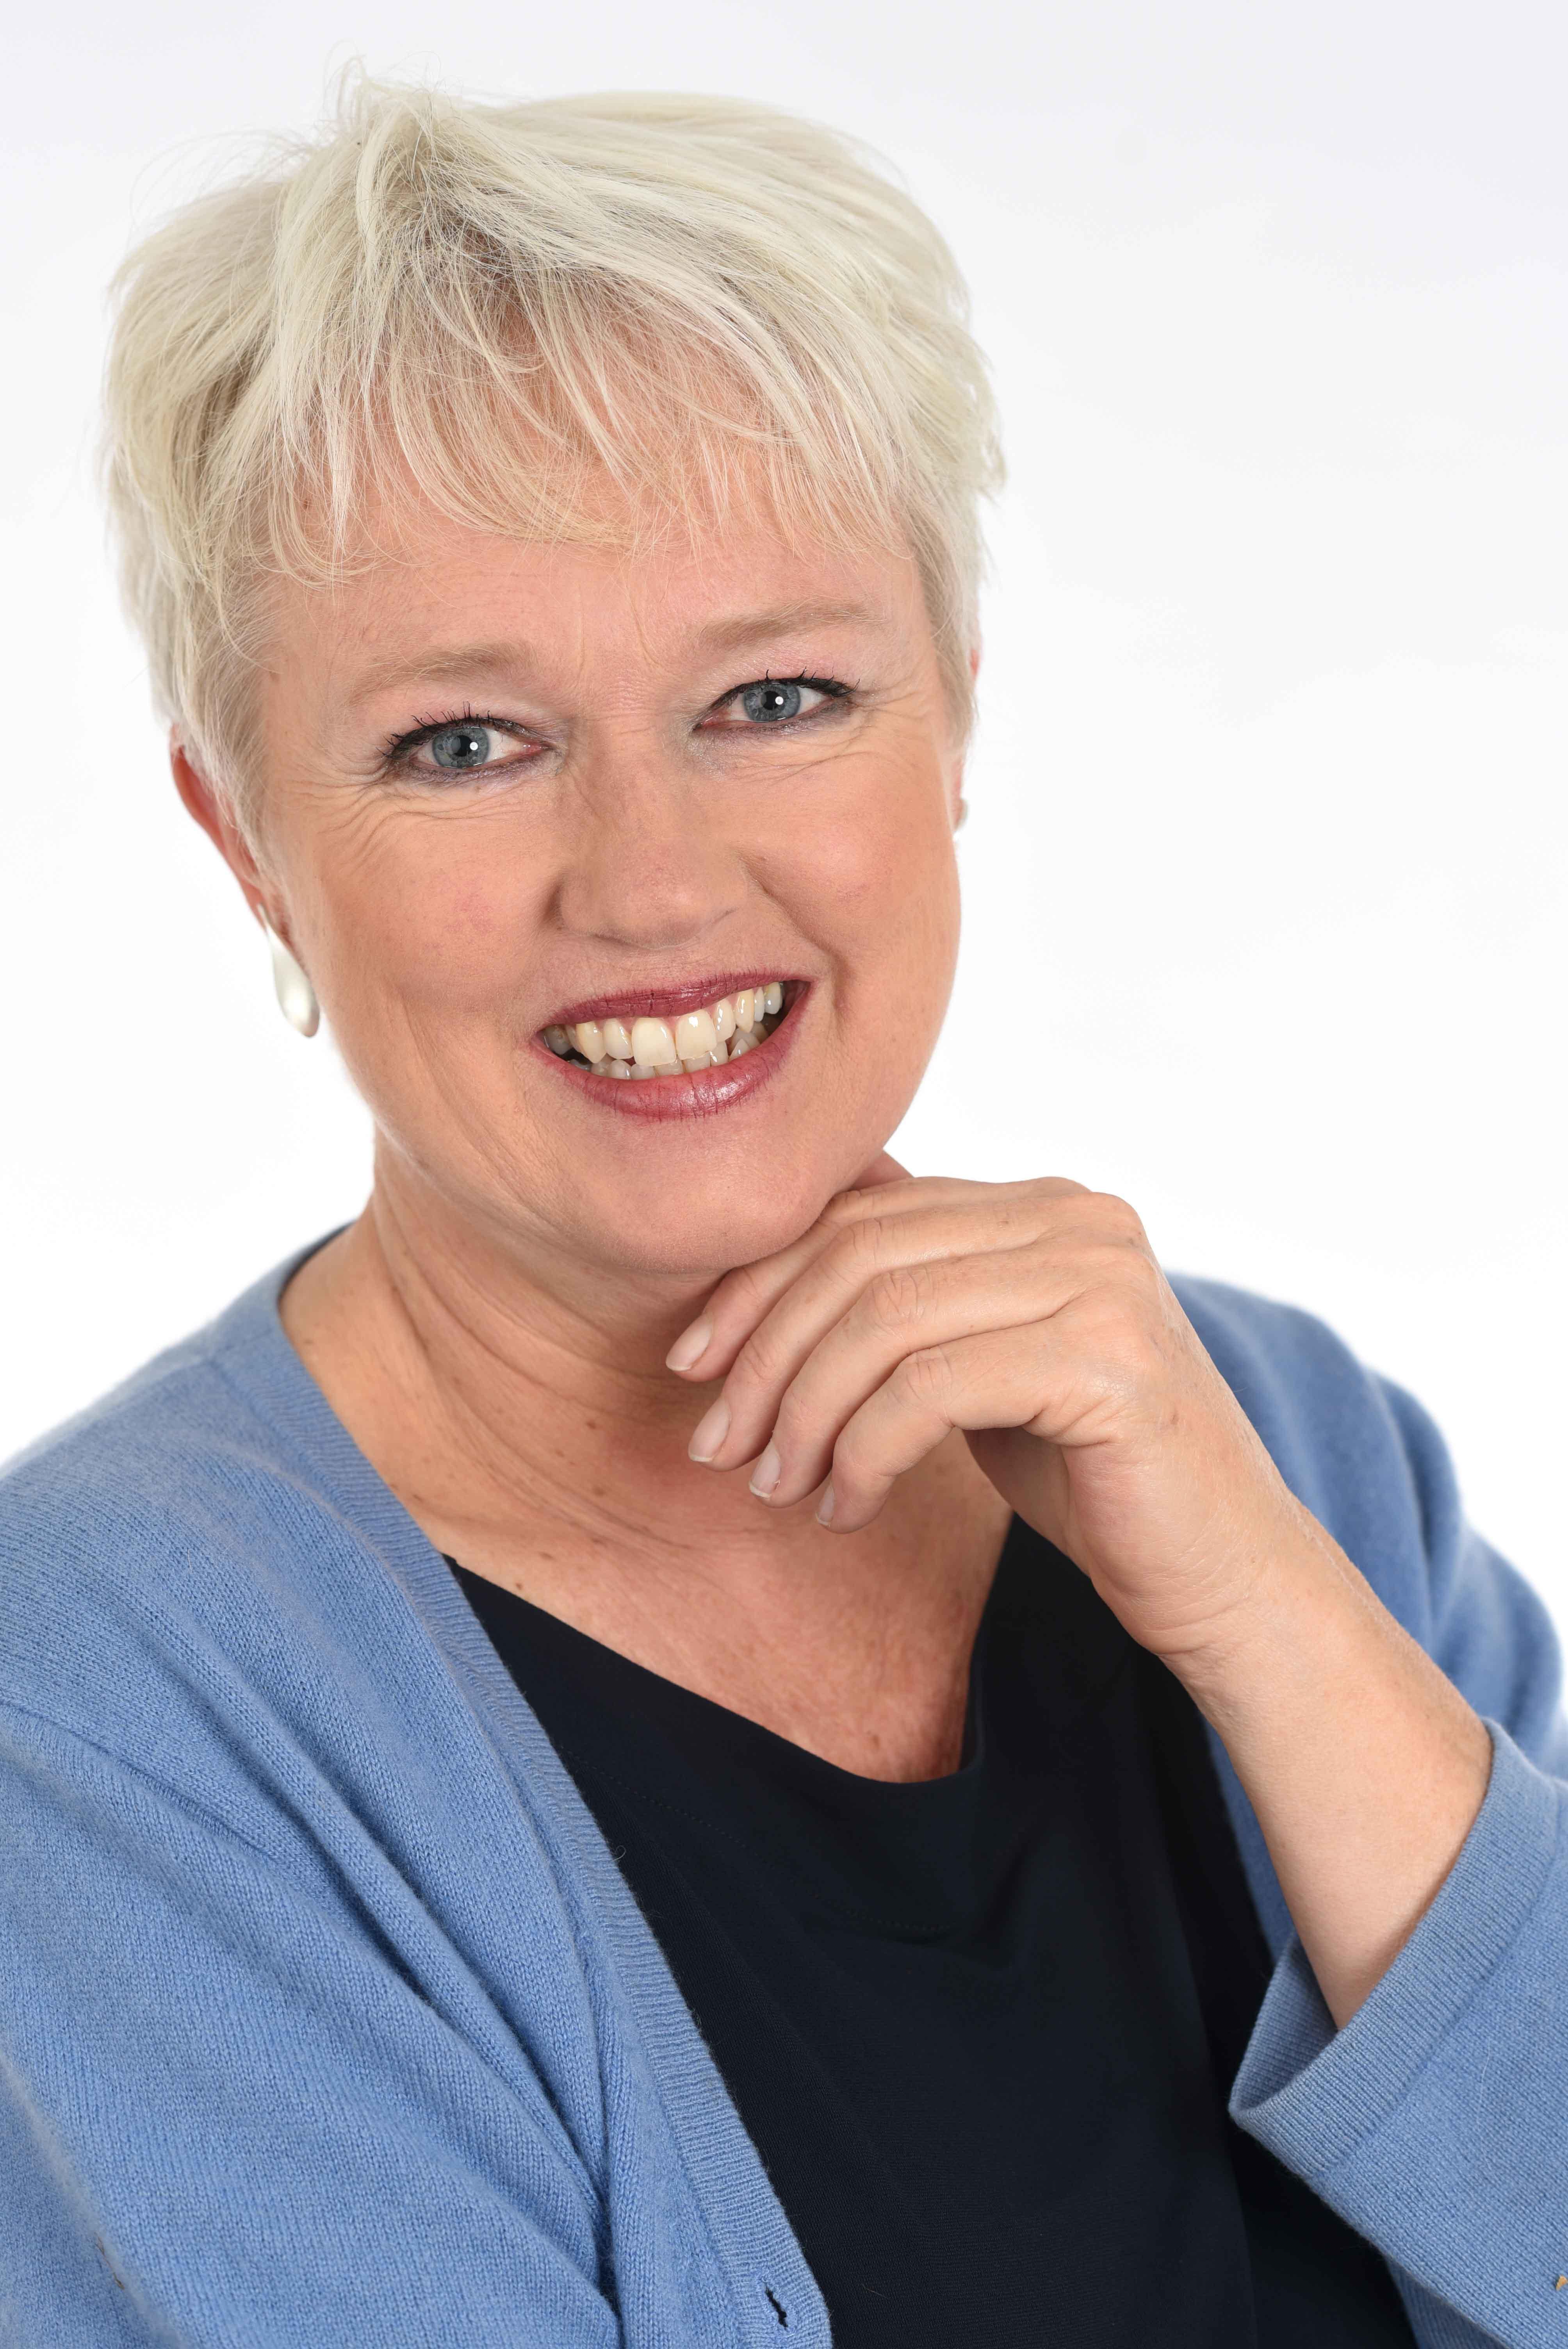 auteursportret boekomslag Heidi jansen